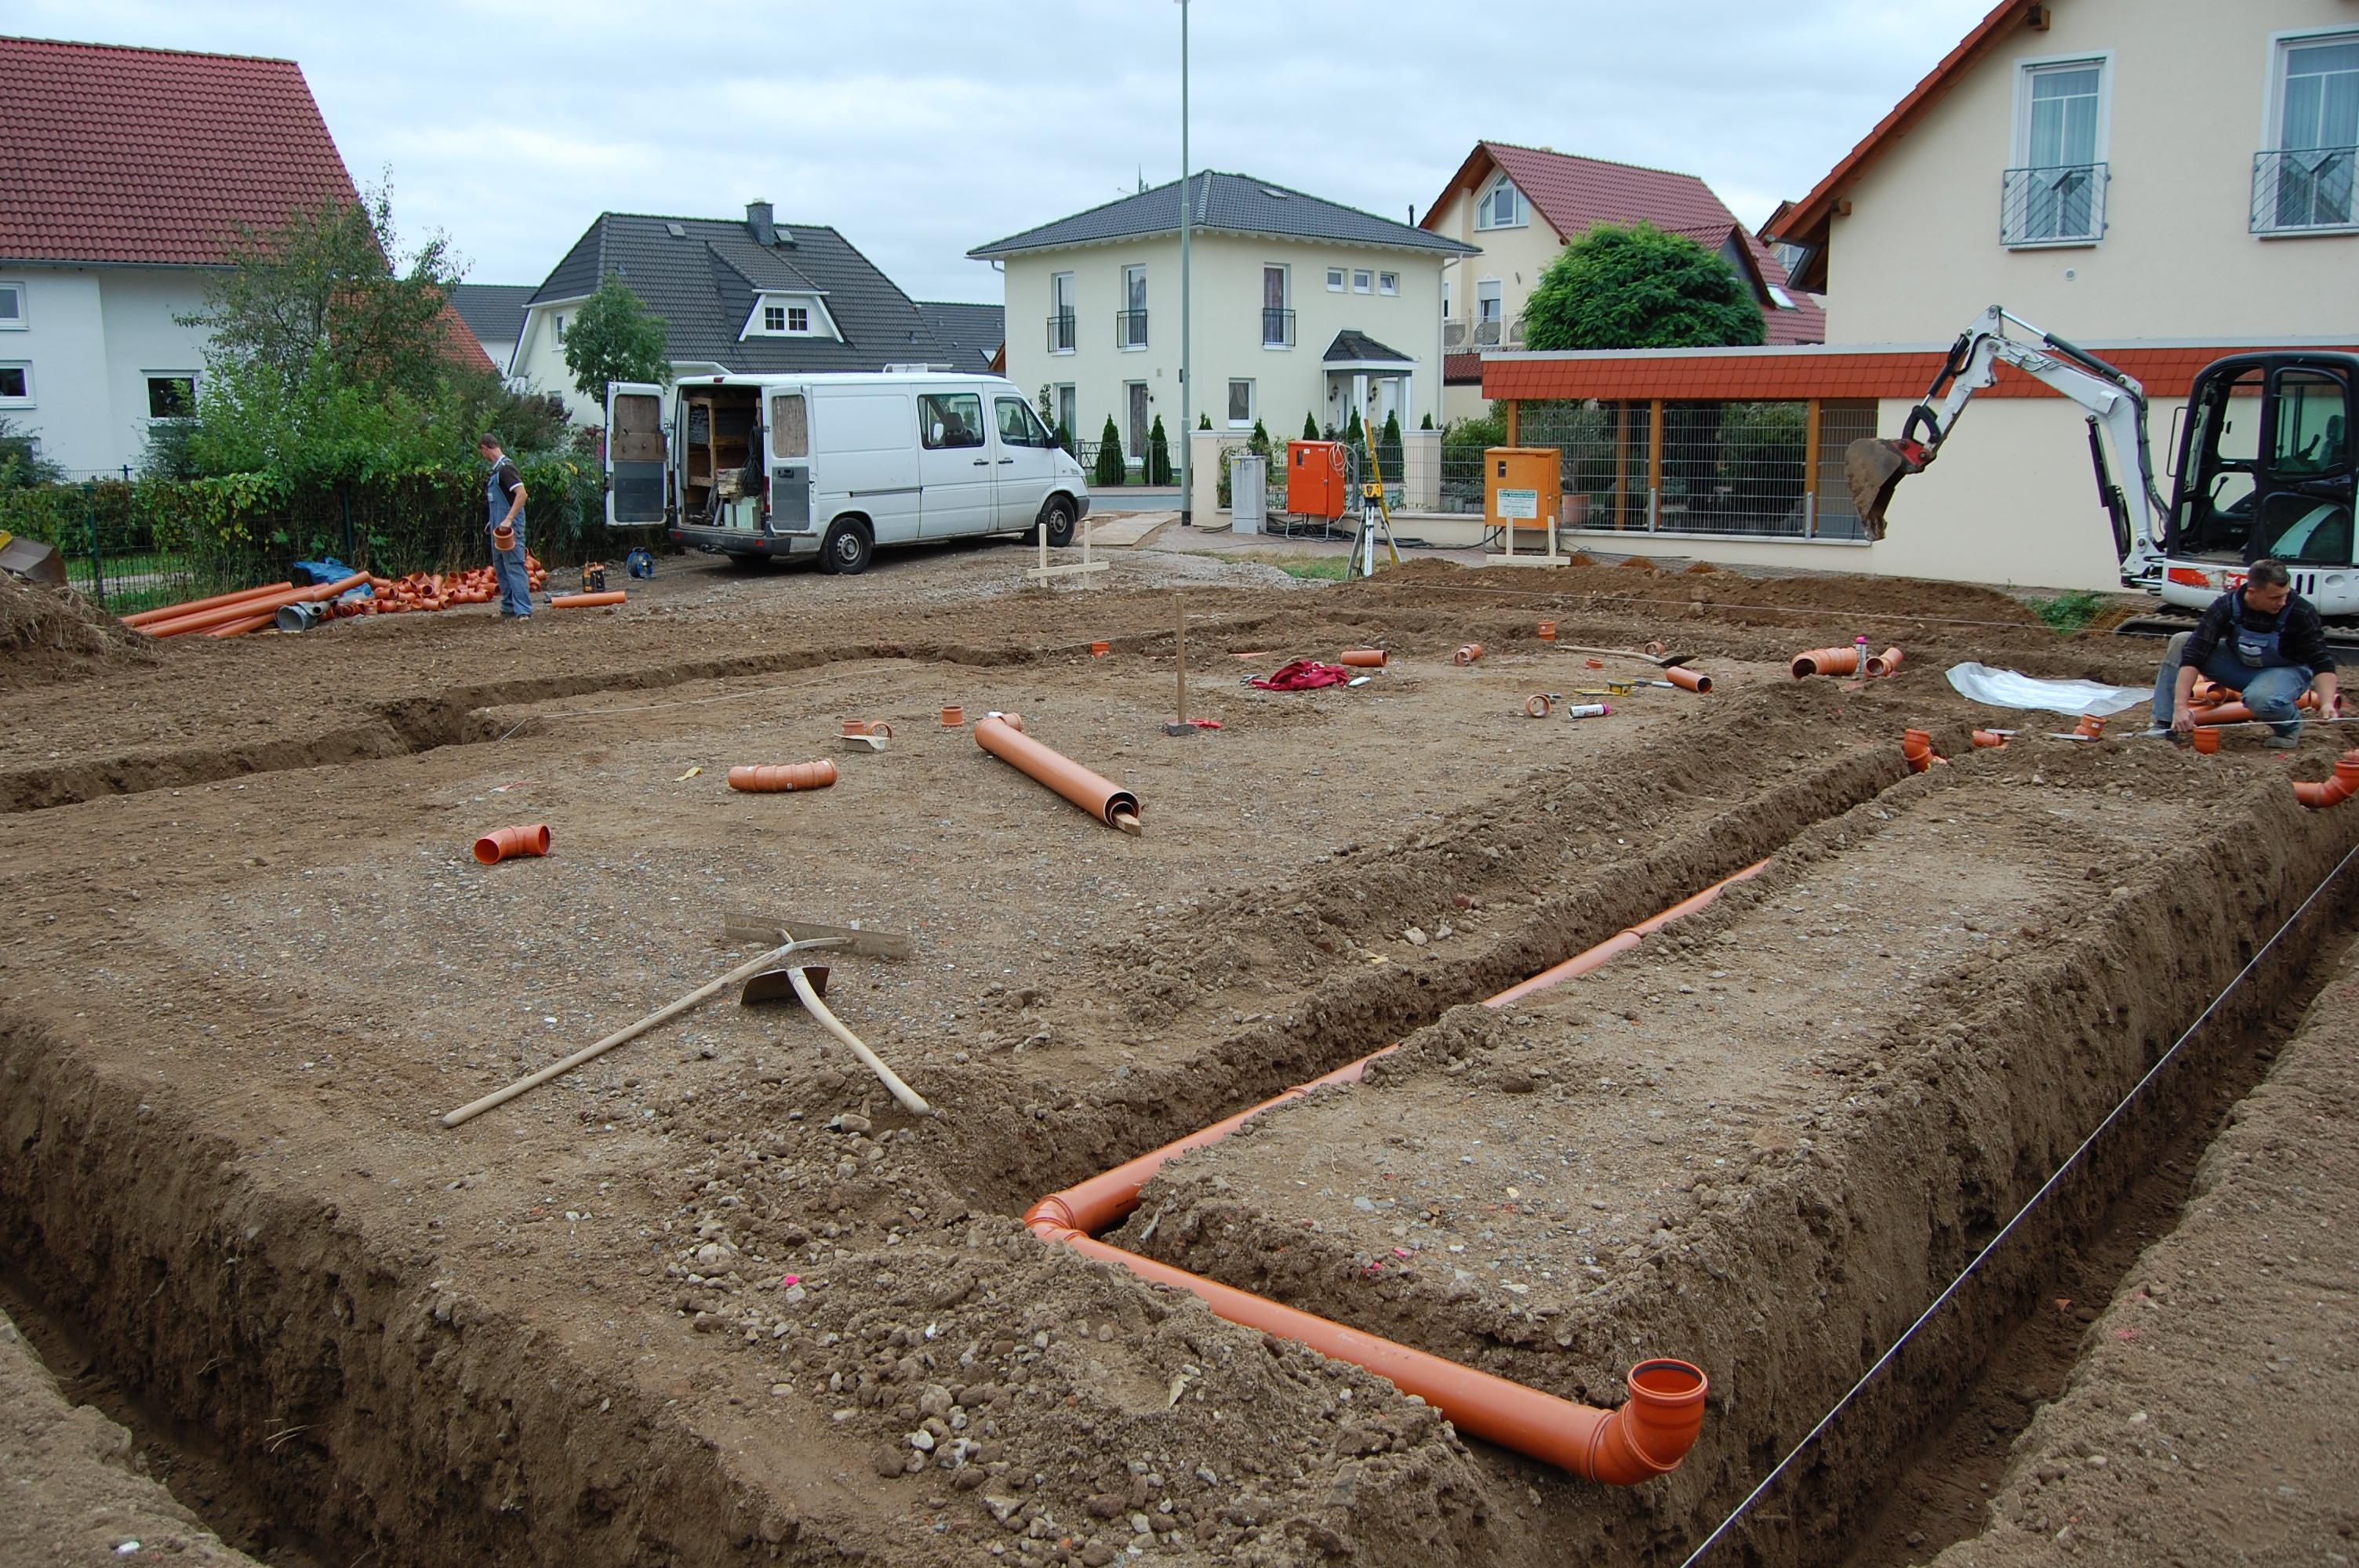 Bodenplatte Haus Ohne Keller Sockel Abdichten Sockel Abdichten